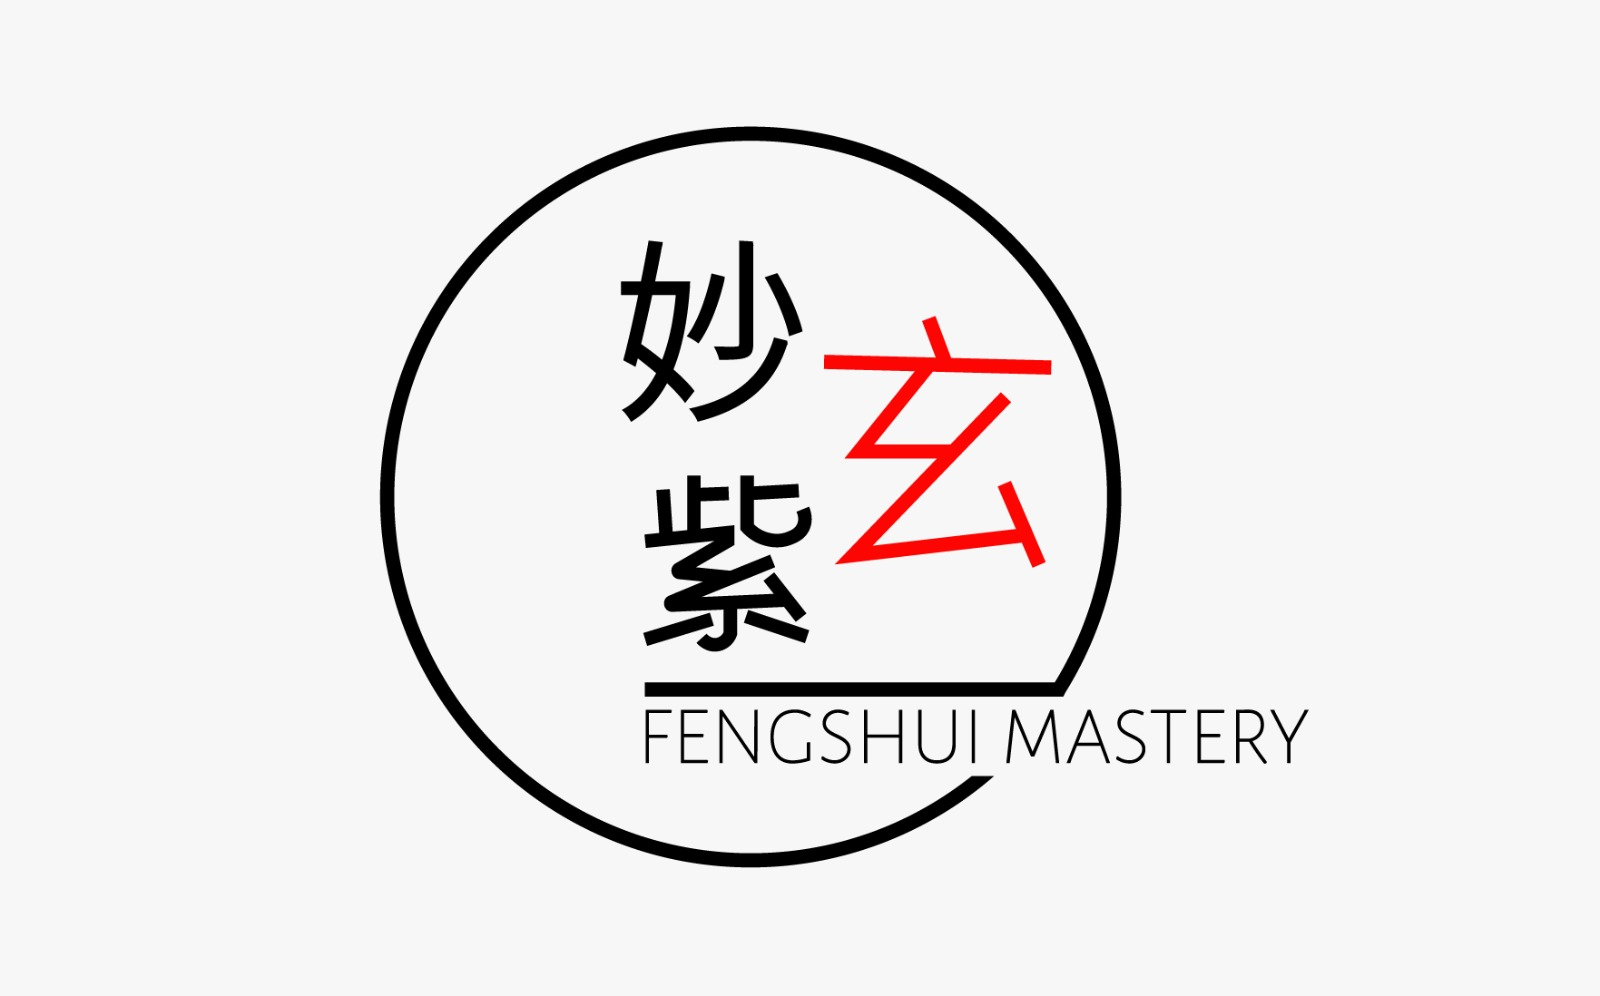 fengshui mastery logo